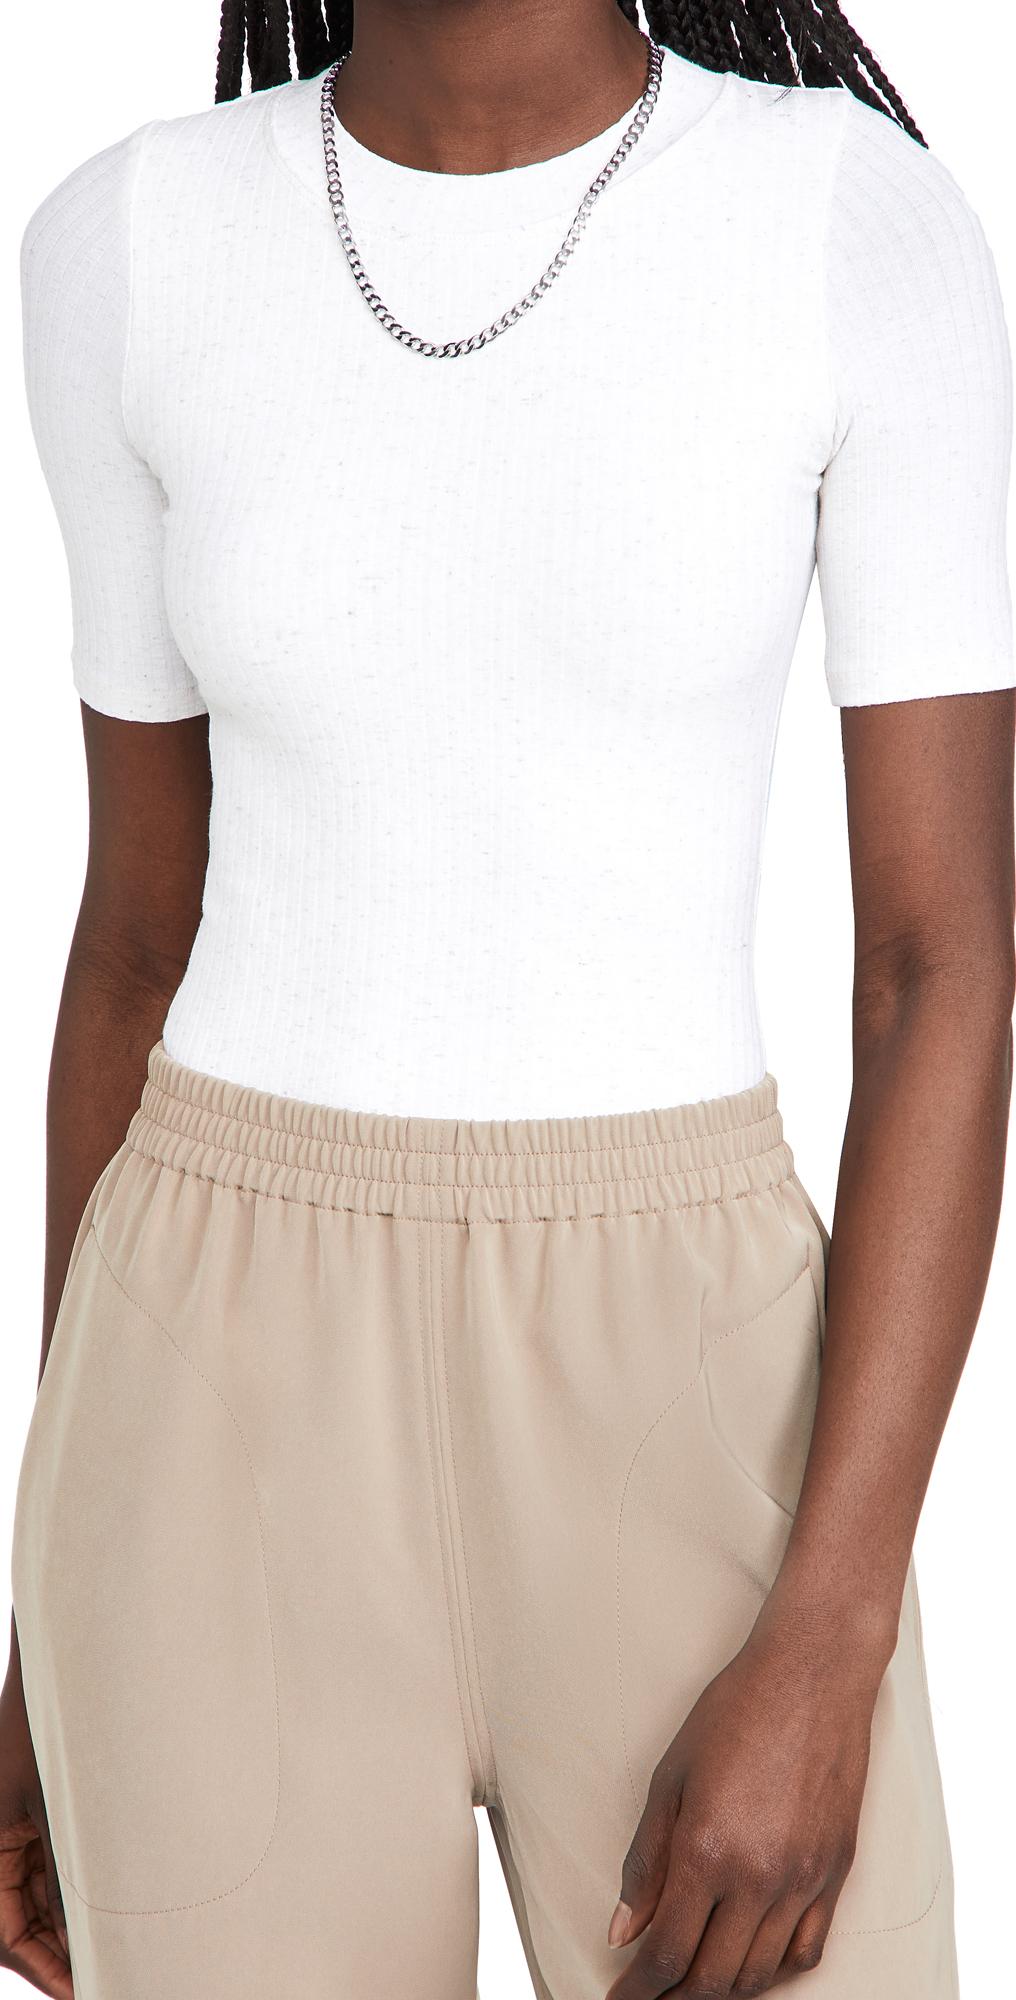 Ridge Novelty Knit Thong Bodysuit